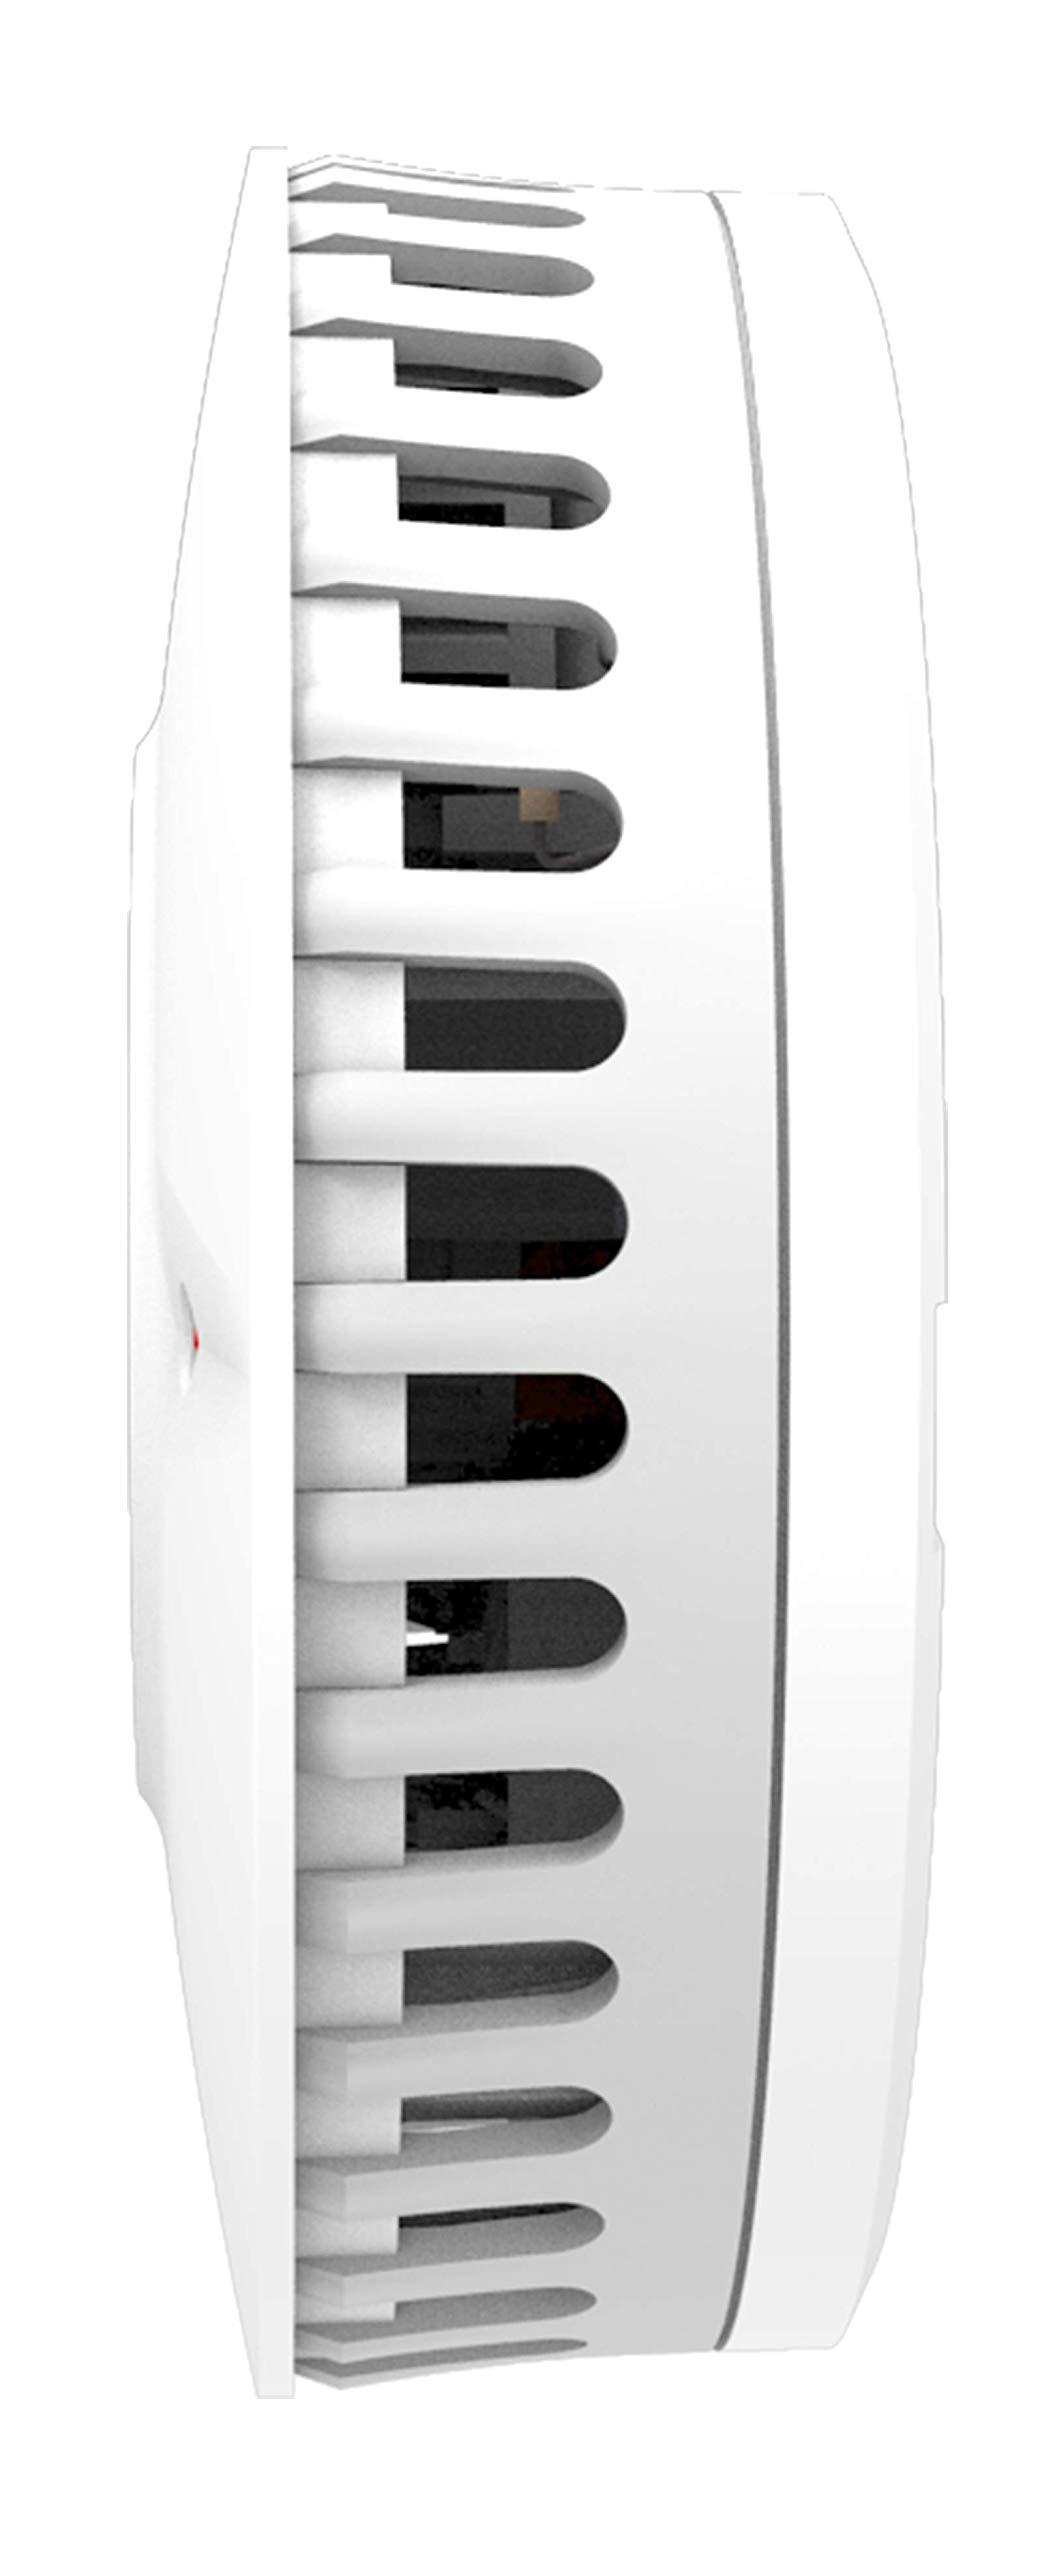 Thermoptek Toast Proof Smoke Alarm - FireAngel ST-625 3